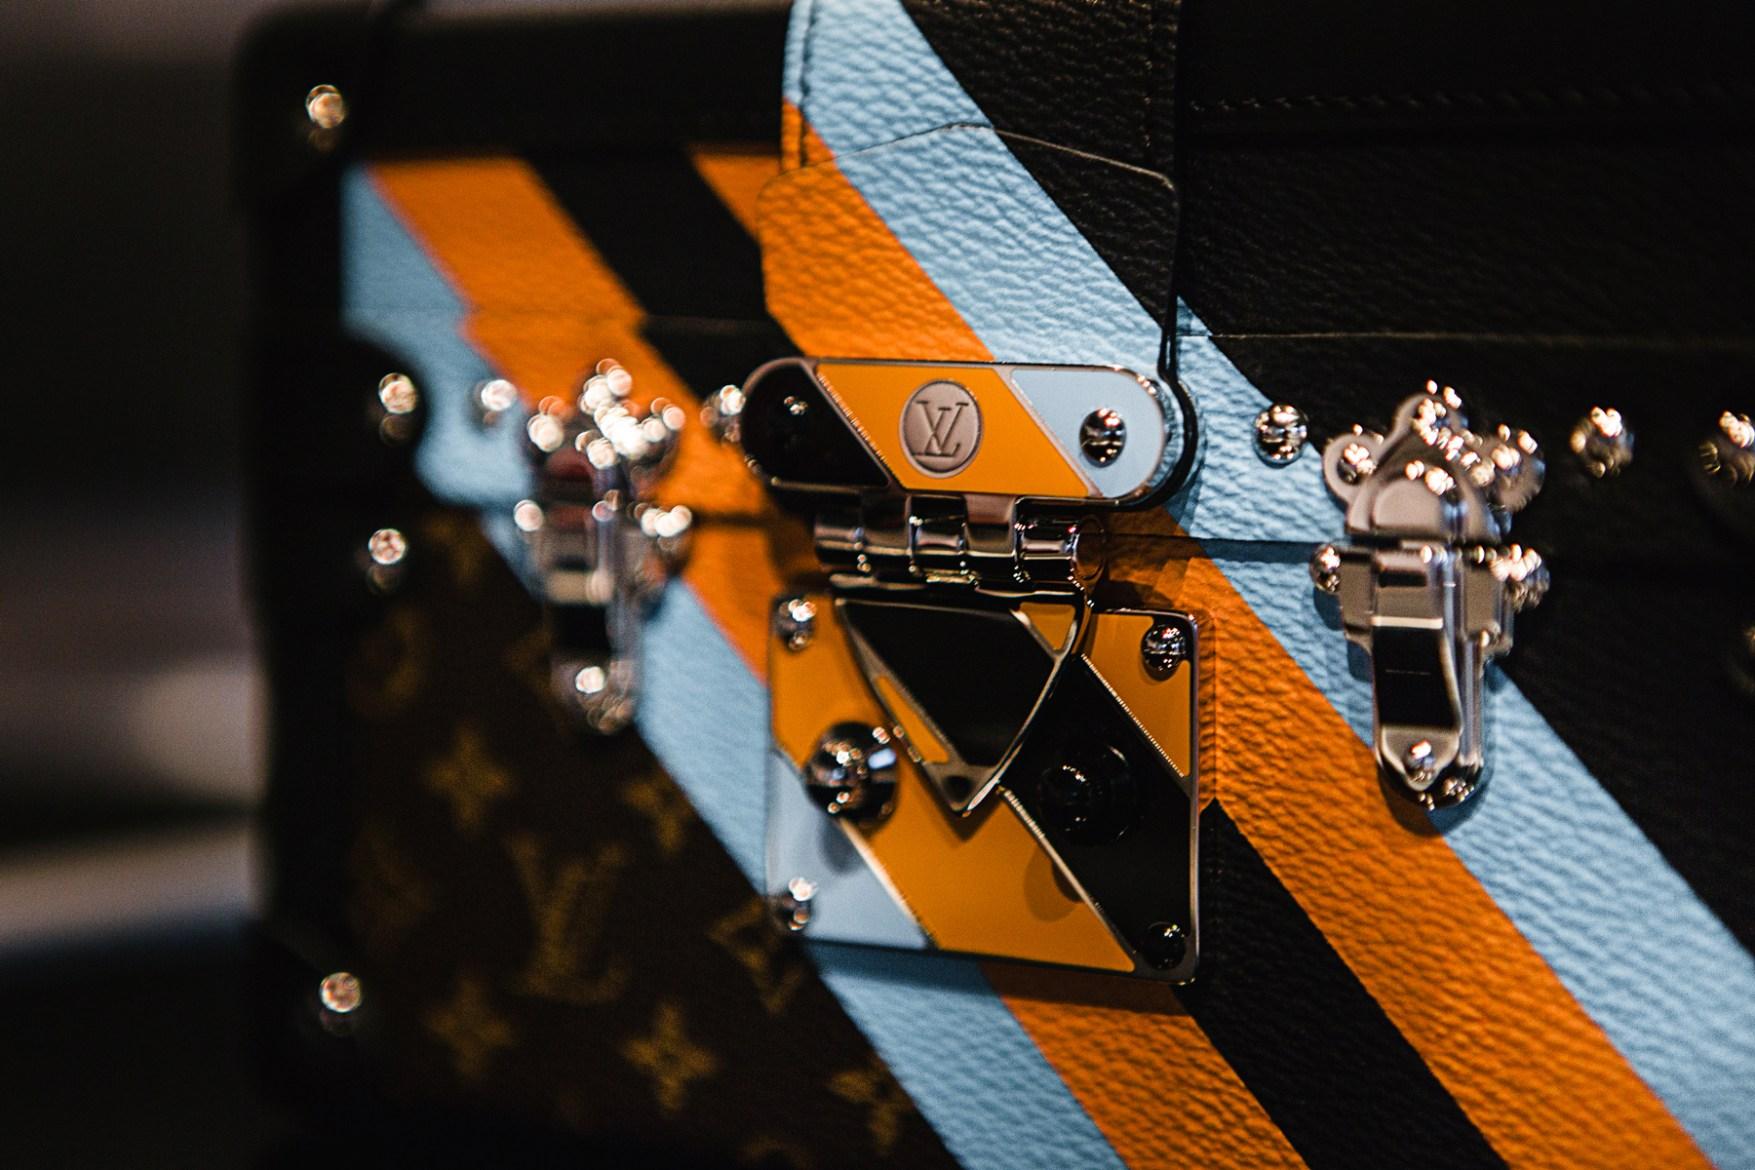 Up-Close With Louis Vuitton's 2016 Hong Kong Pre-Fall Presentation